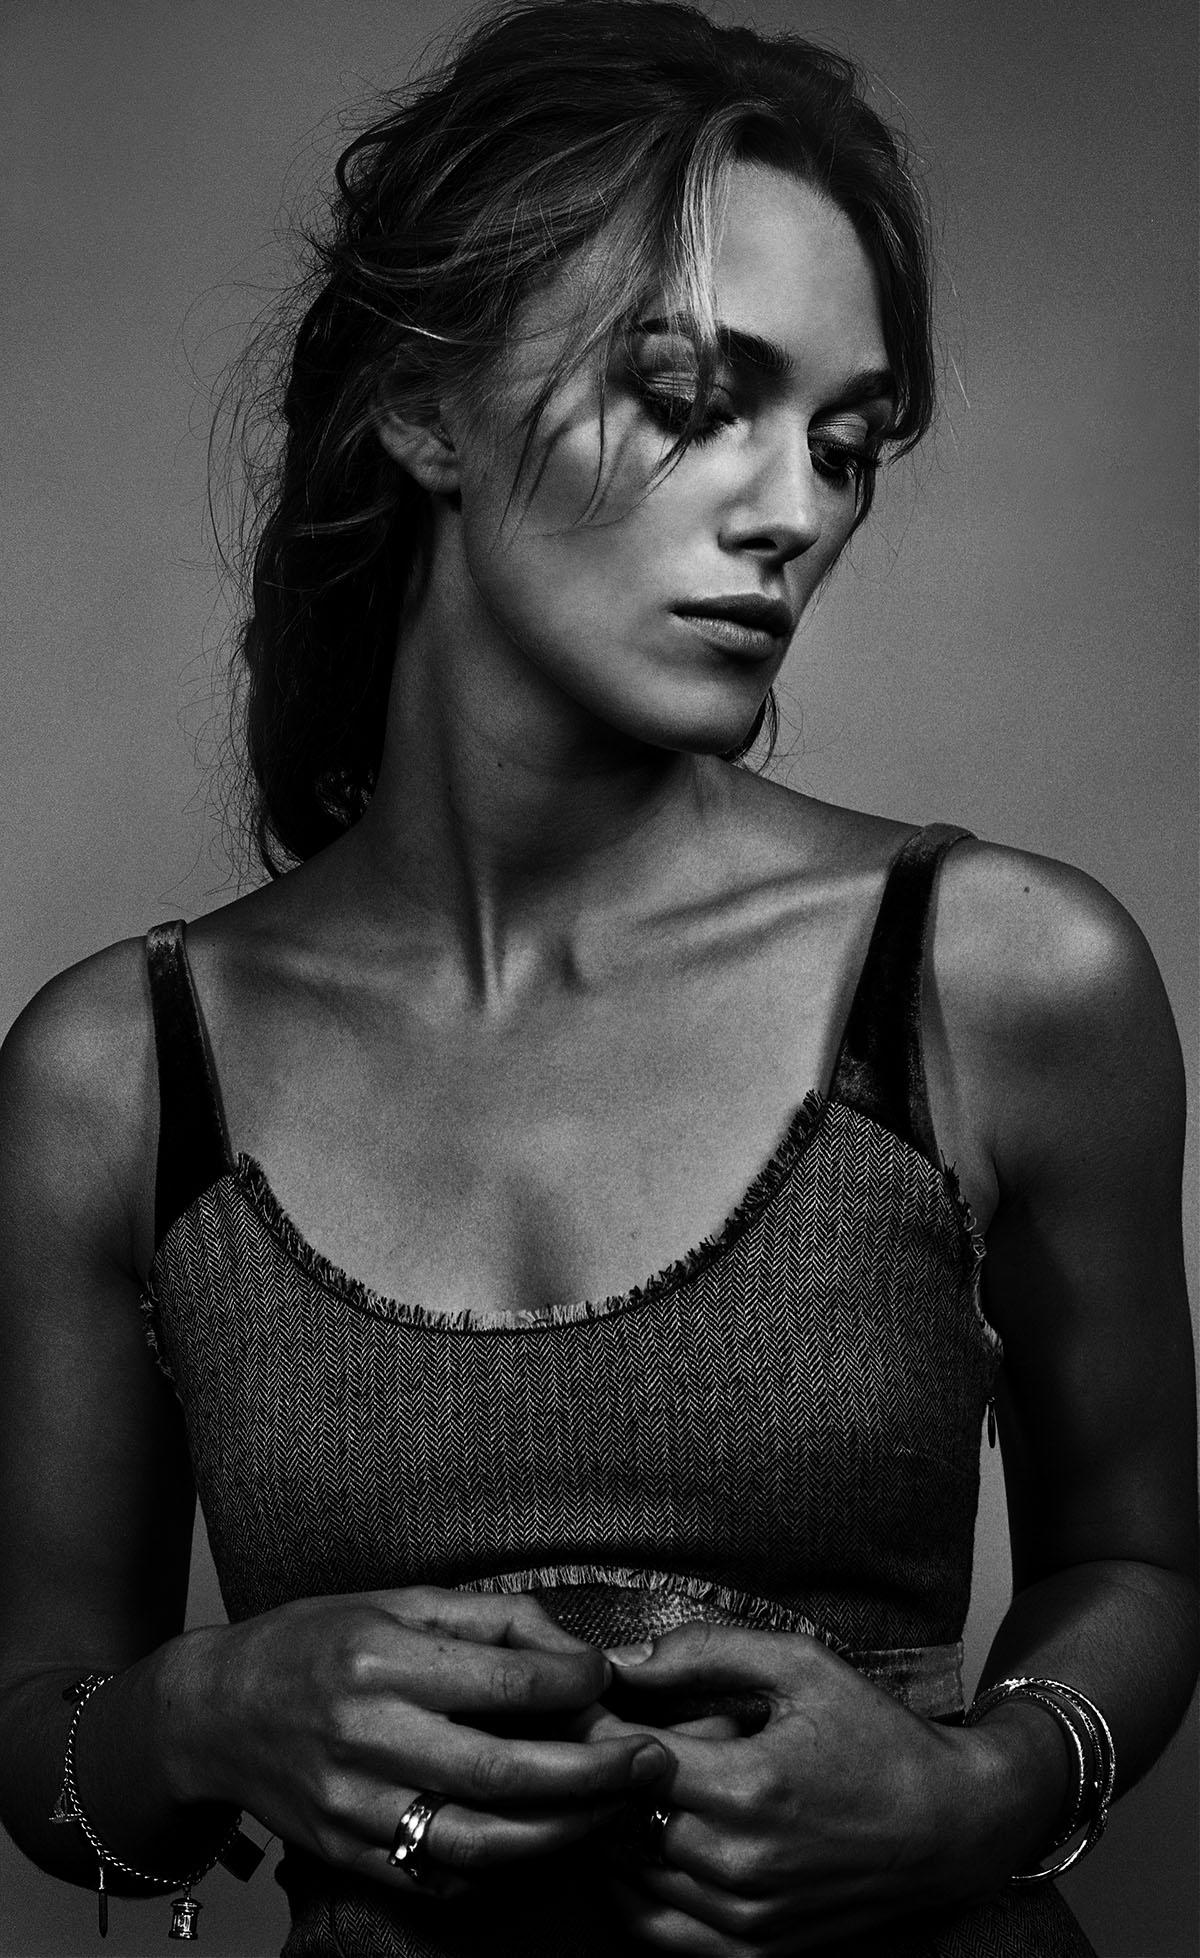 Keira Knightley - New York City